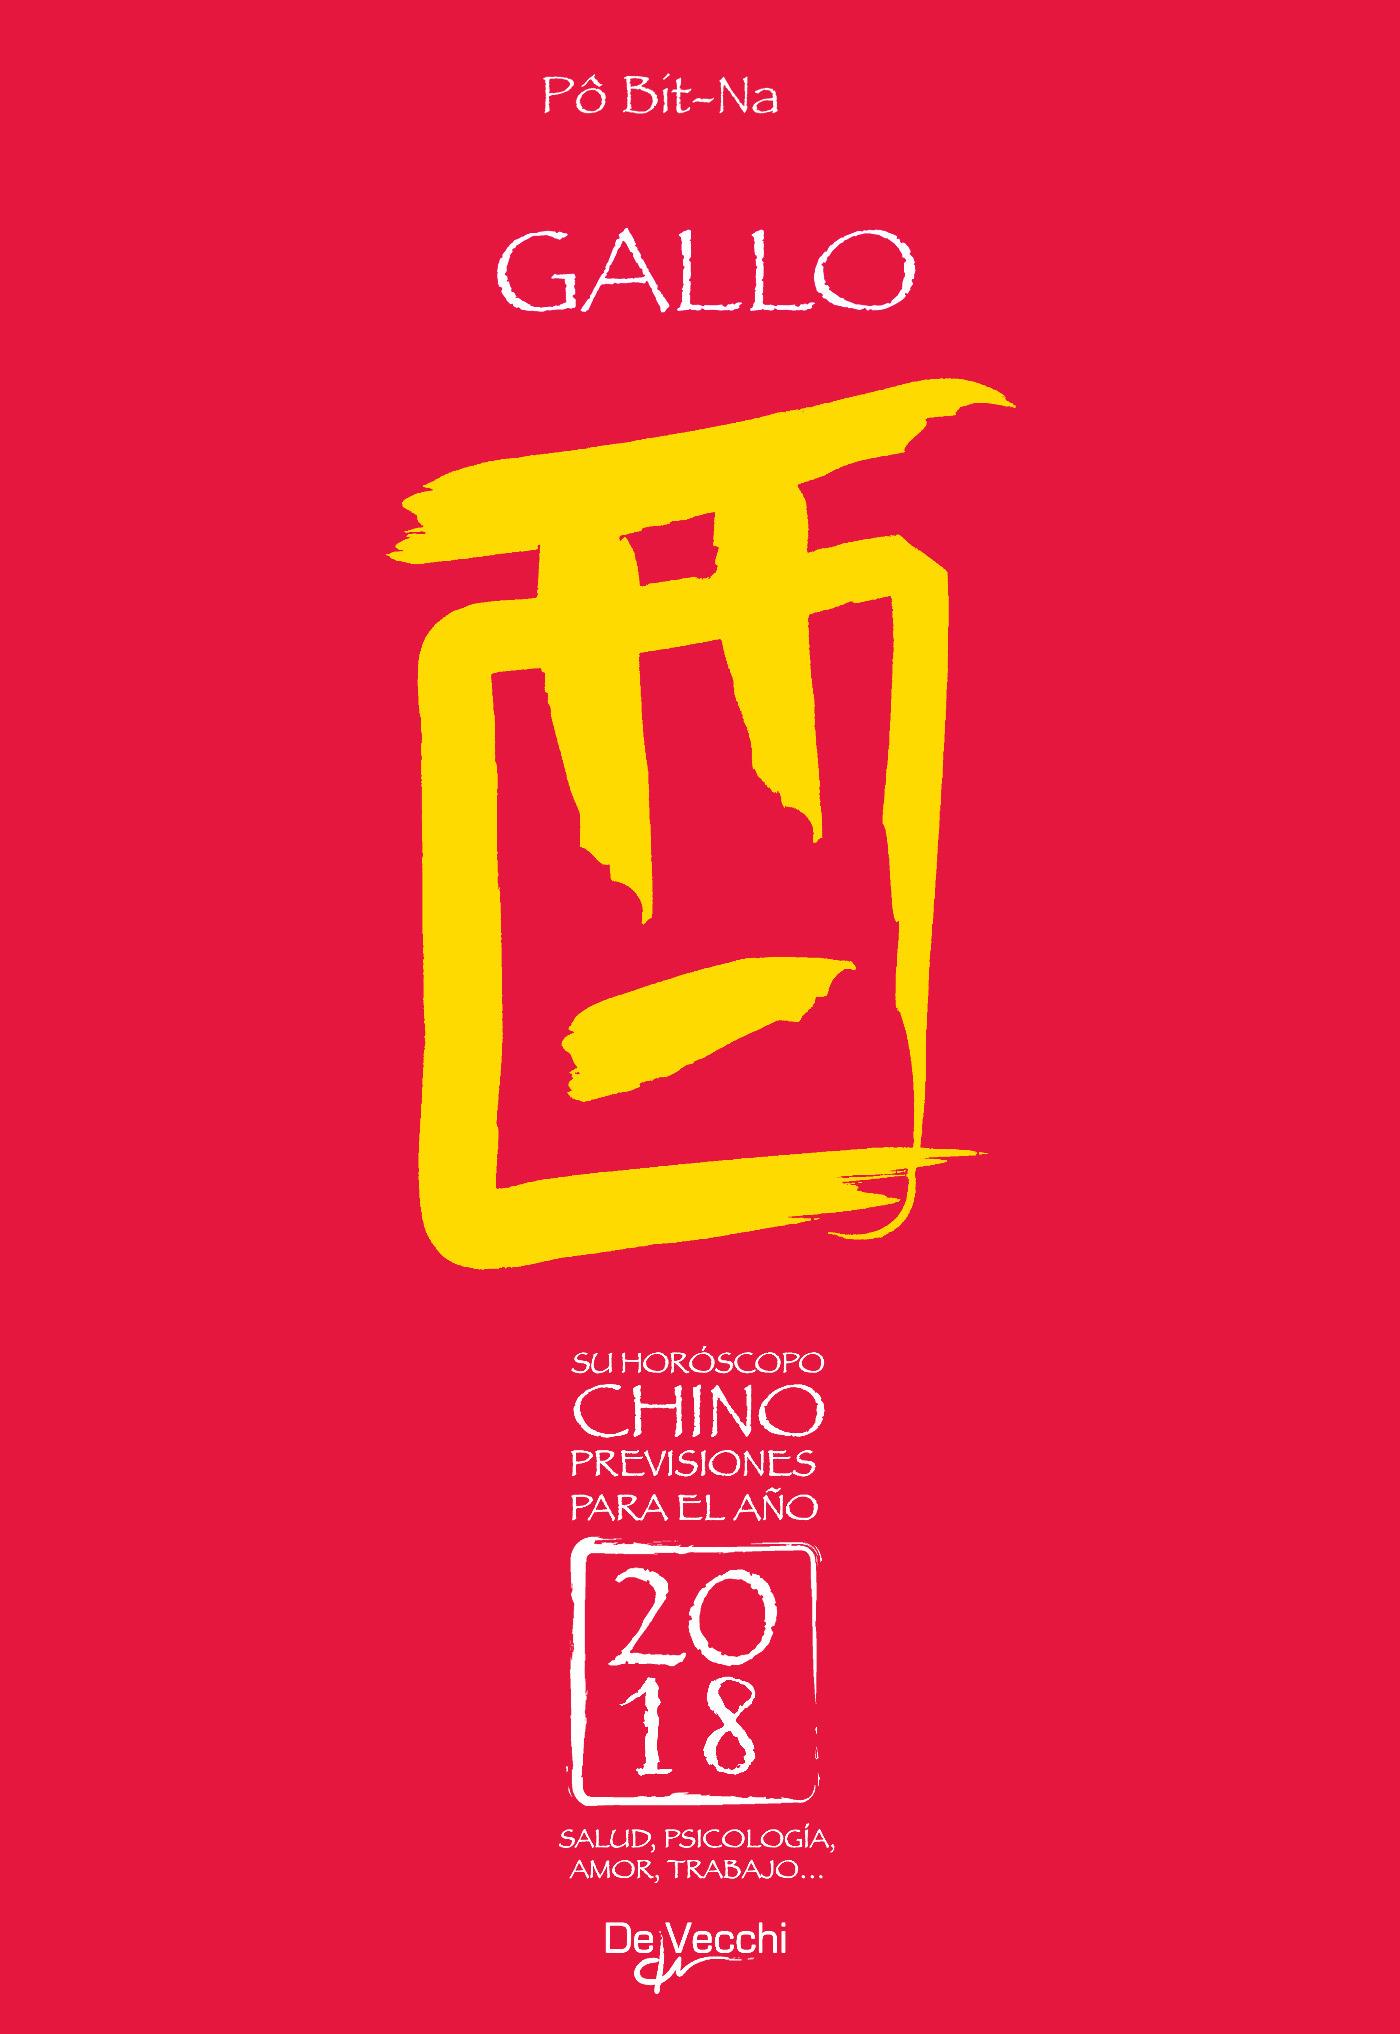 Bit-Na, Pô - Su horóscopo chino. Gallo, ebook